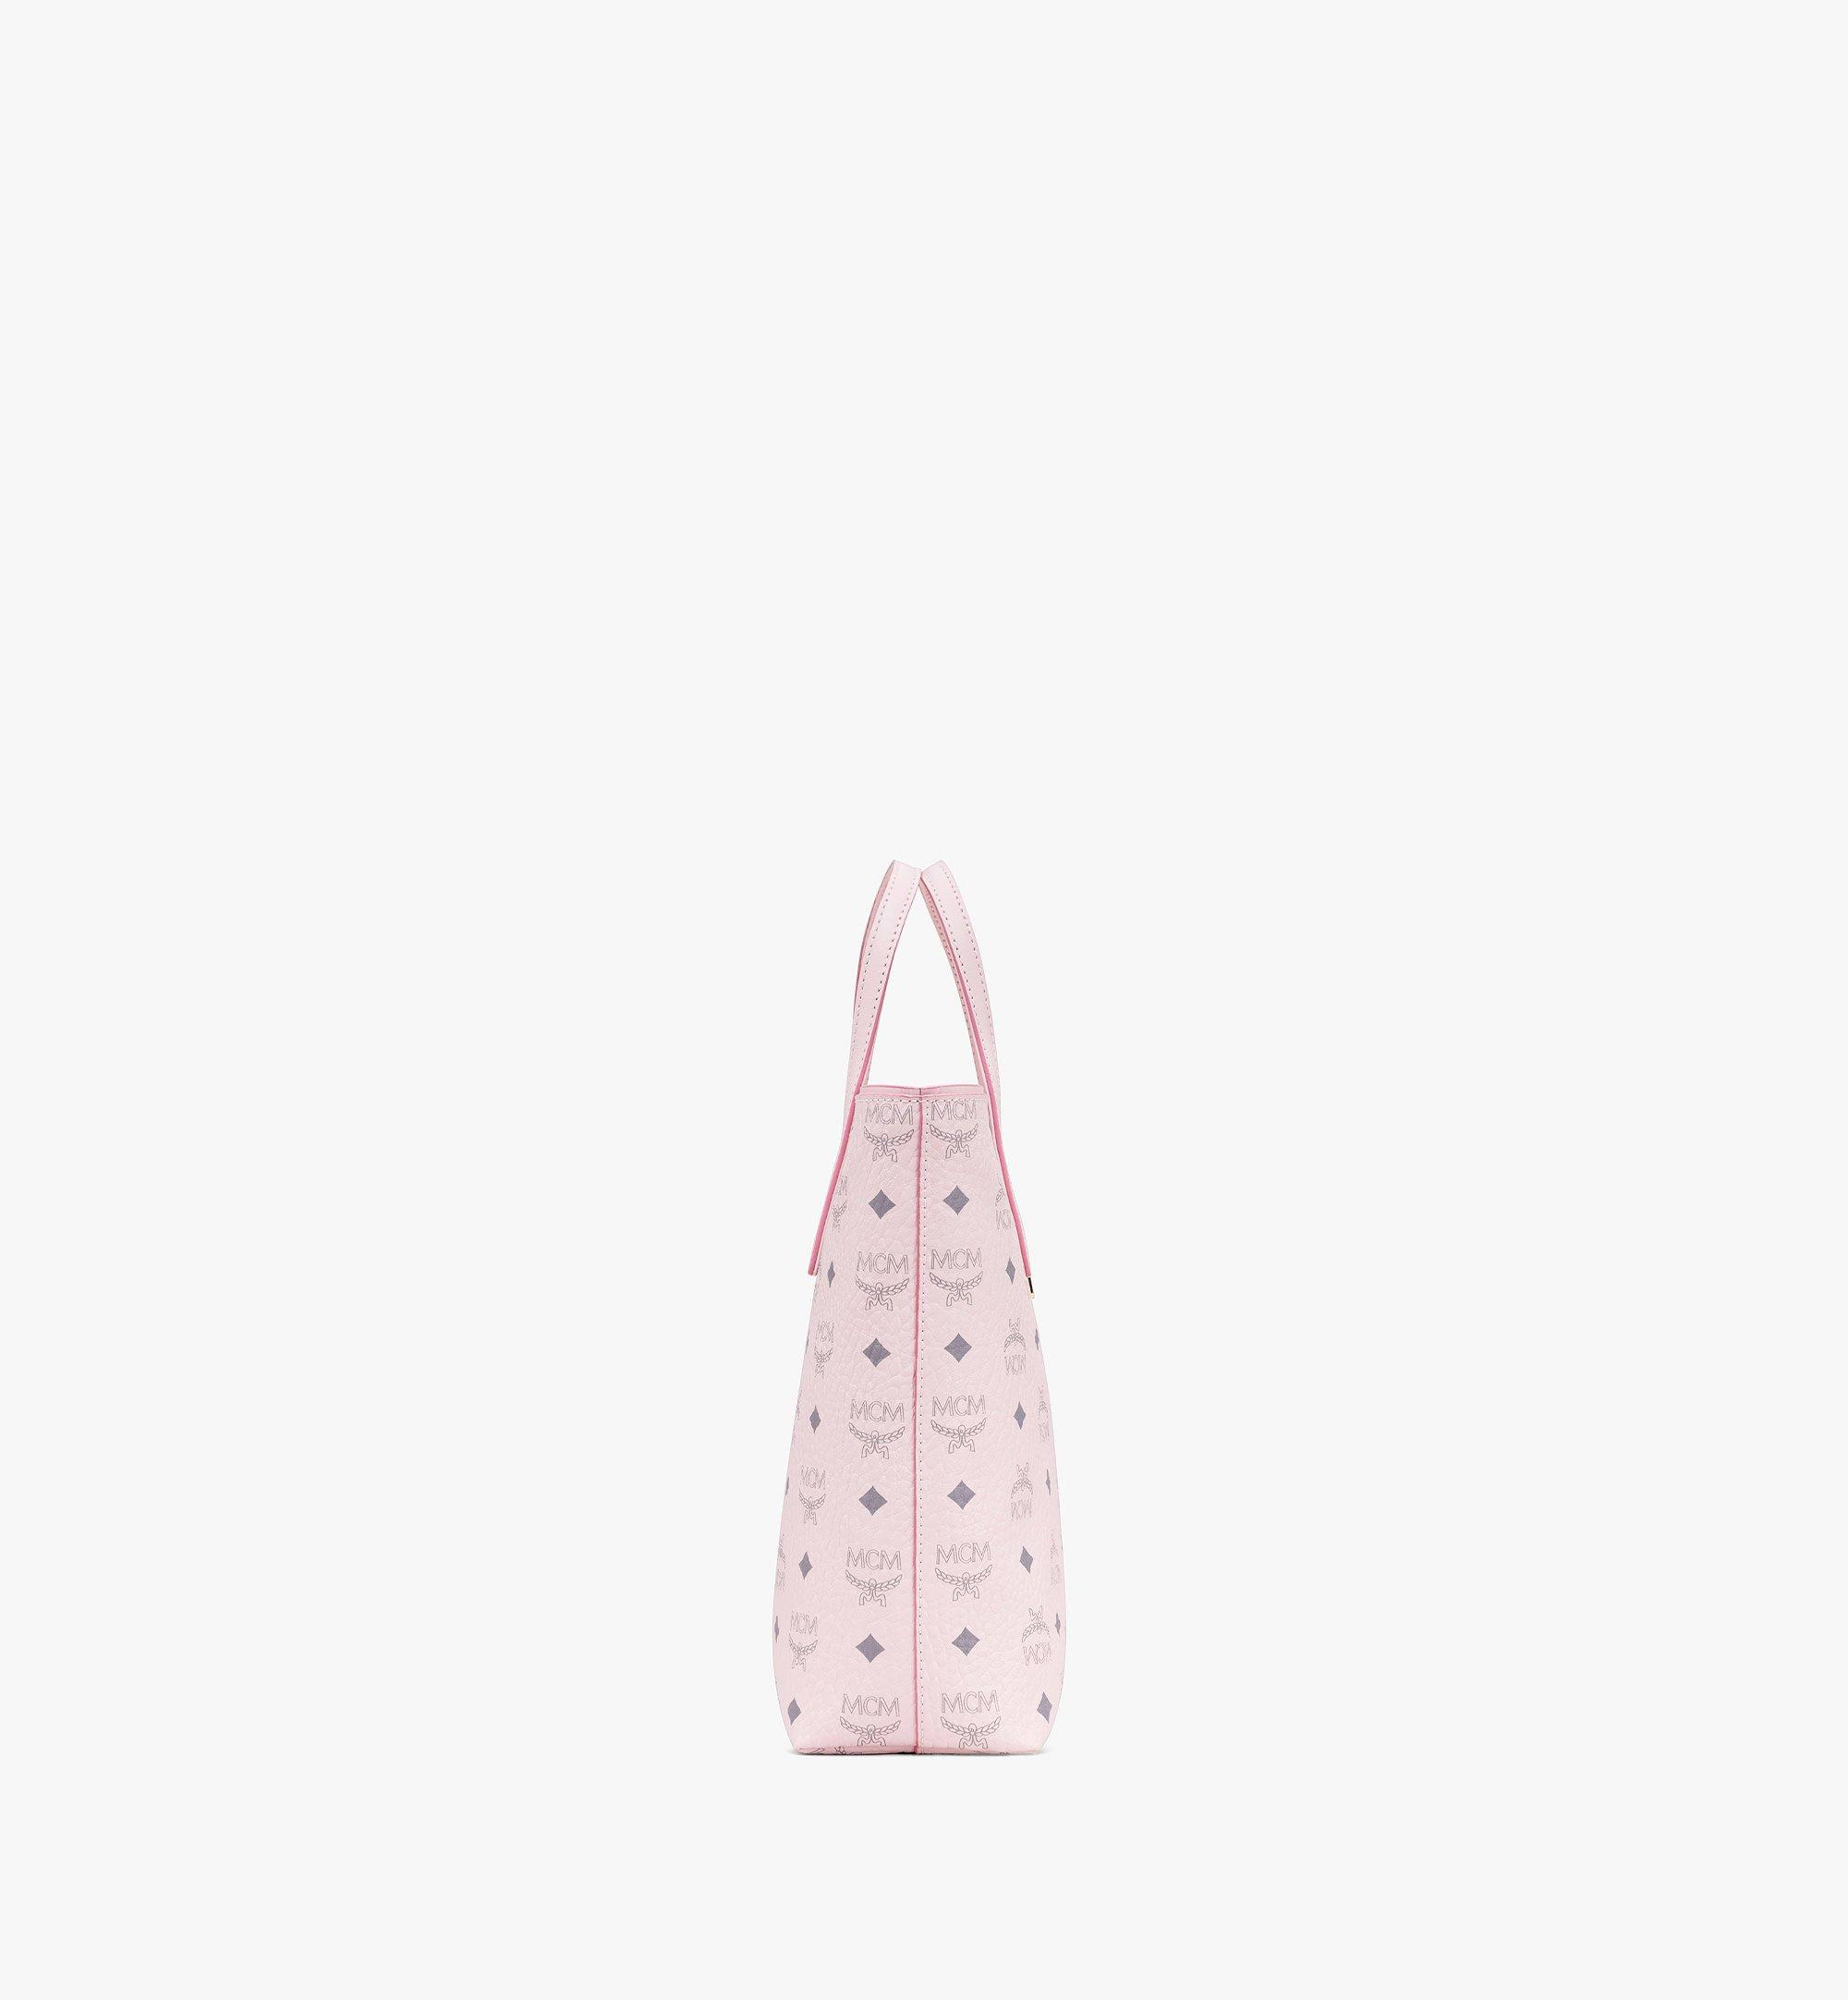 MCM Visetos 系列的 Anya Shopper 包款 Pink MWP9AVI77QH001 更多視圖 1